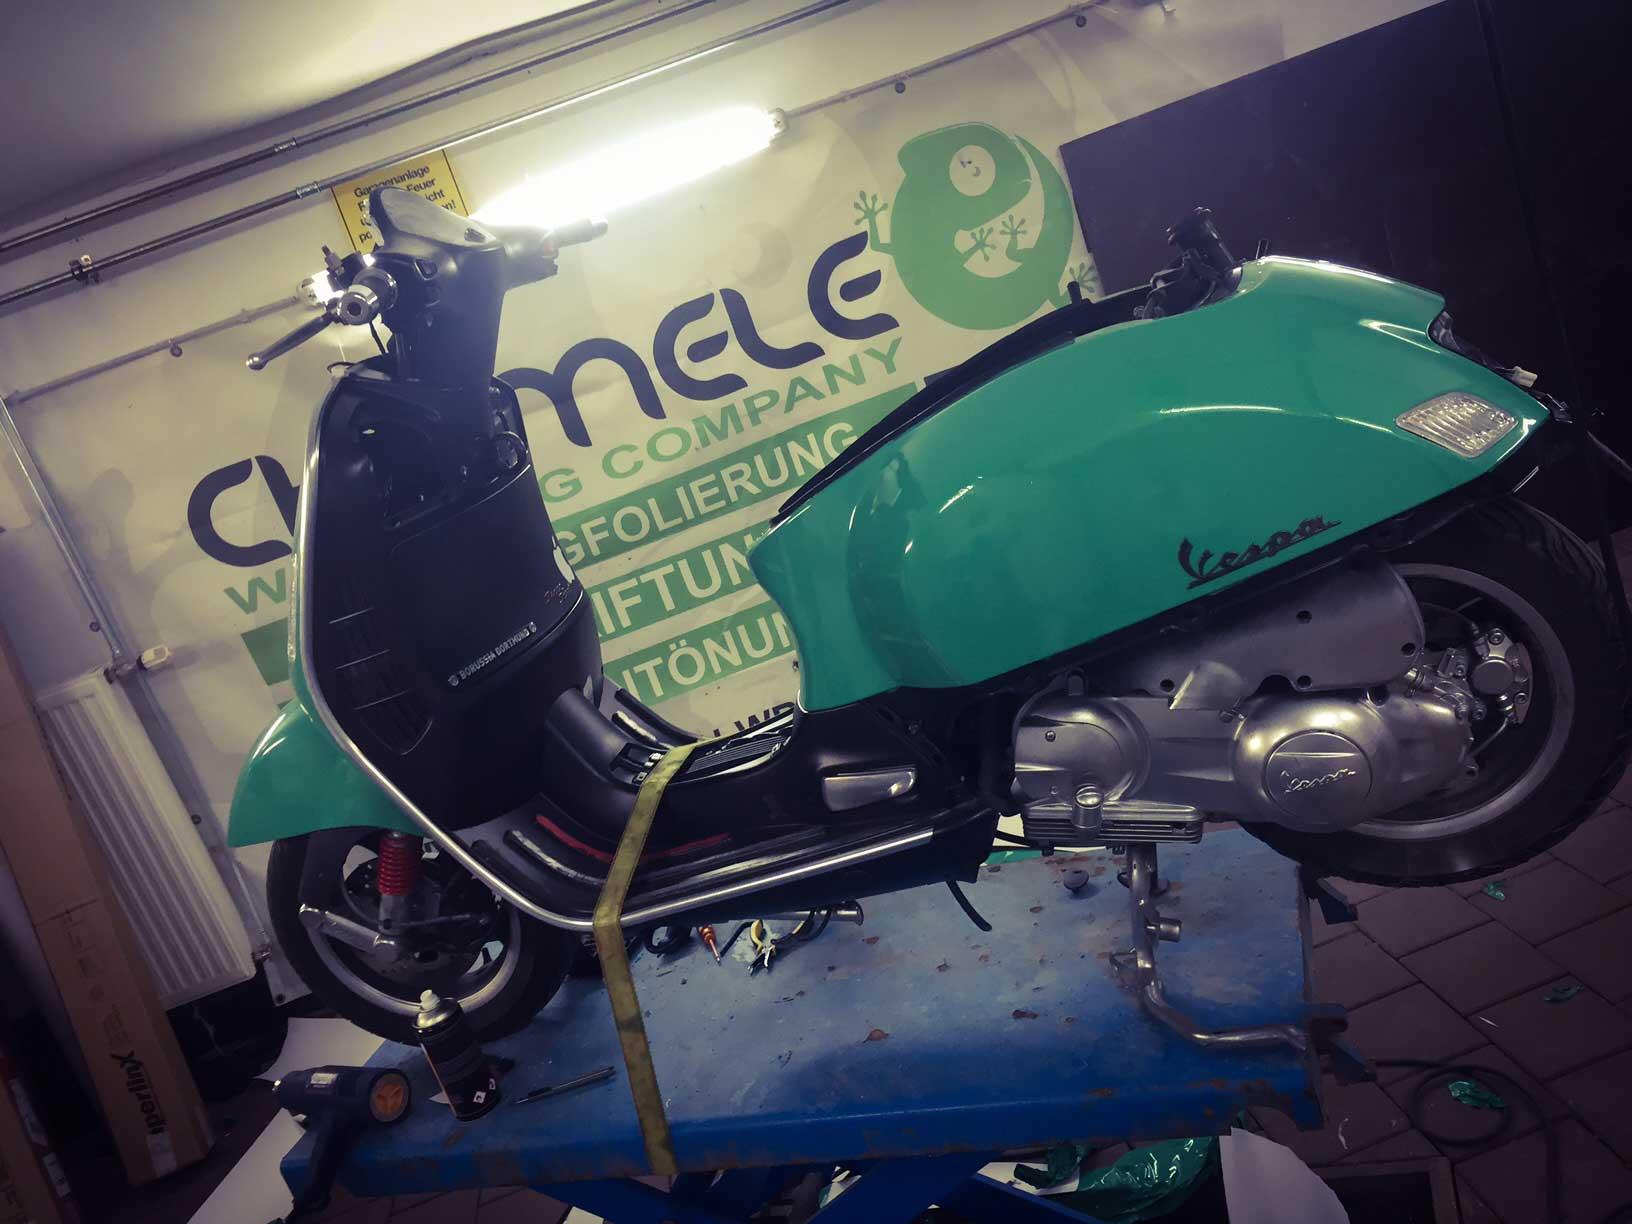 Vespa - Motorroller Chameleon Wrapping Company Eben im Pongau Salzburg